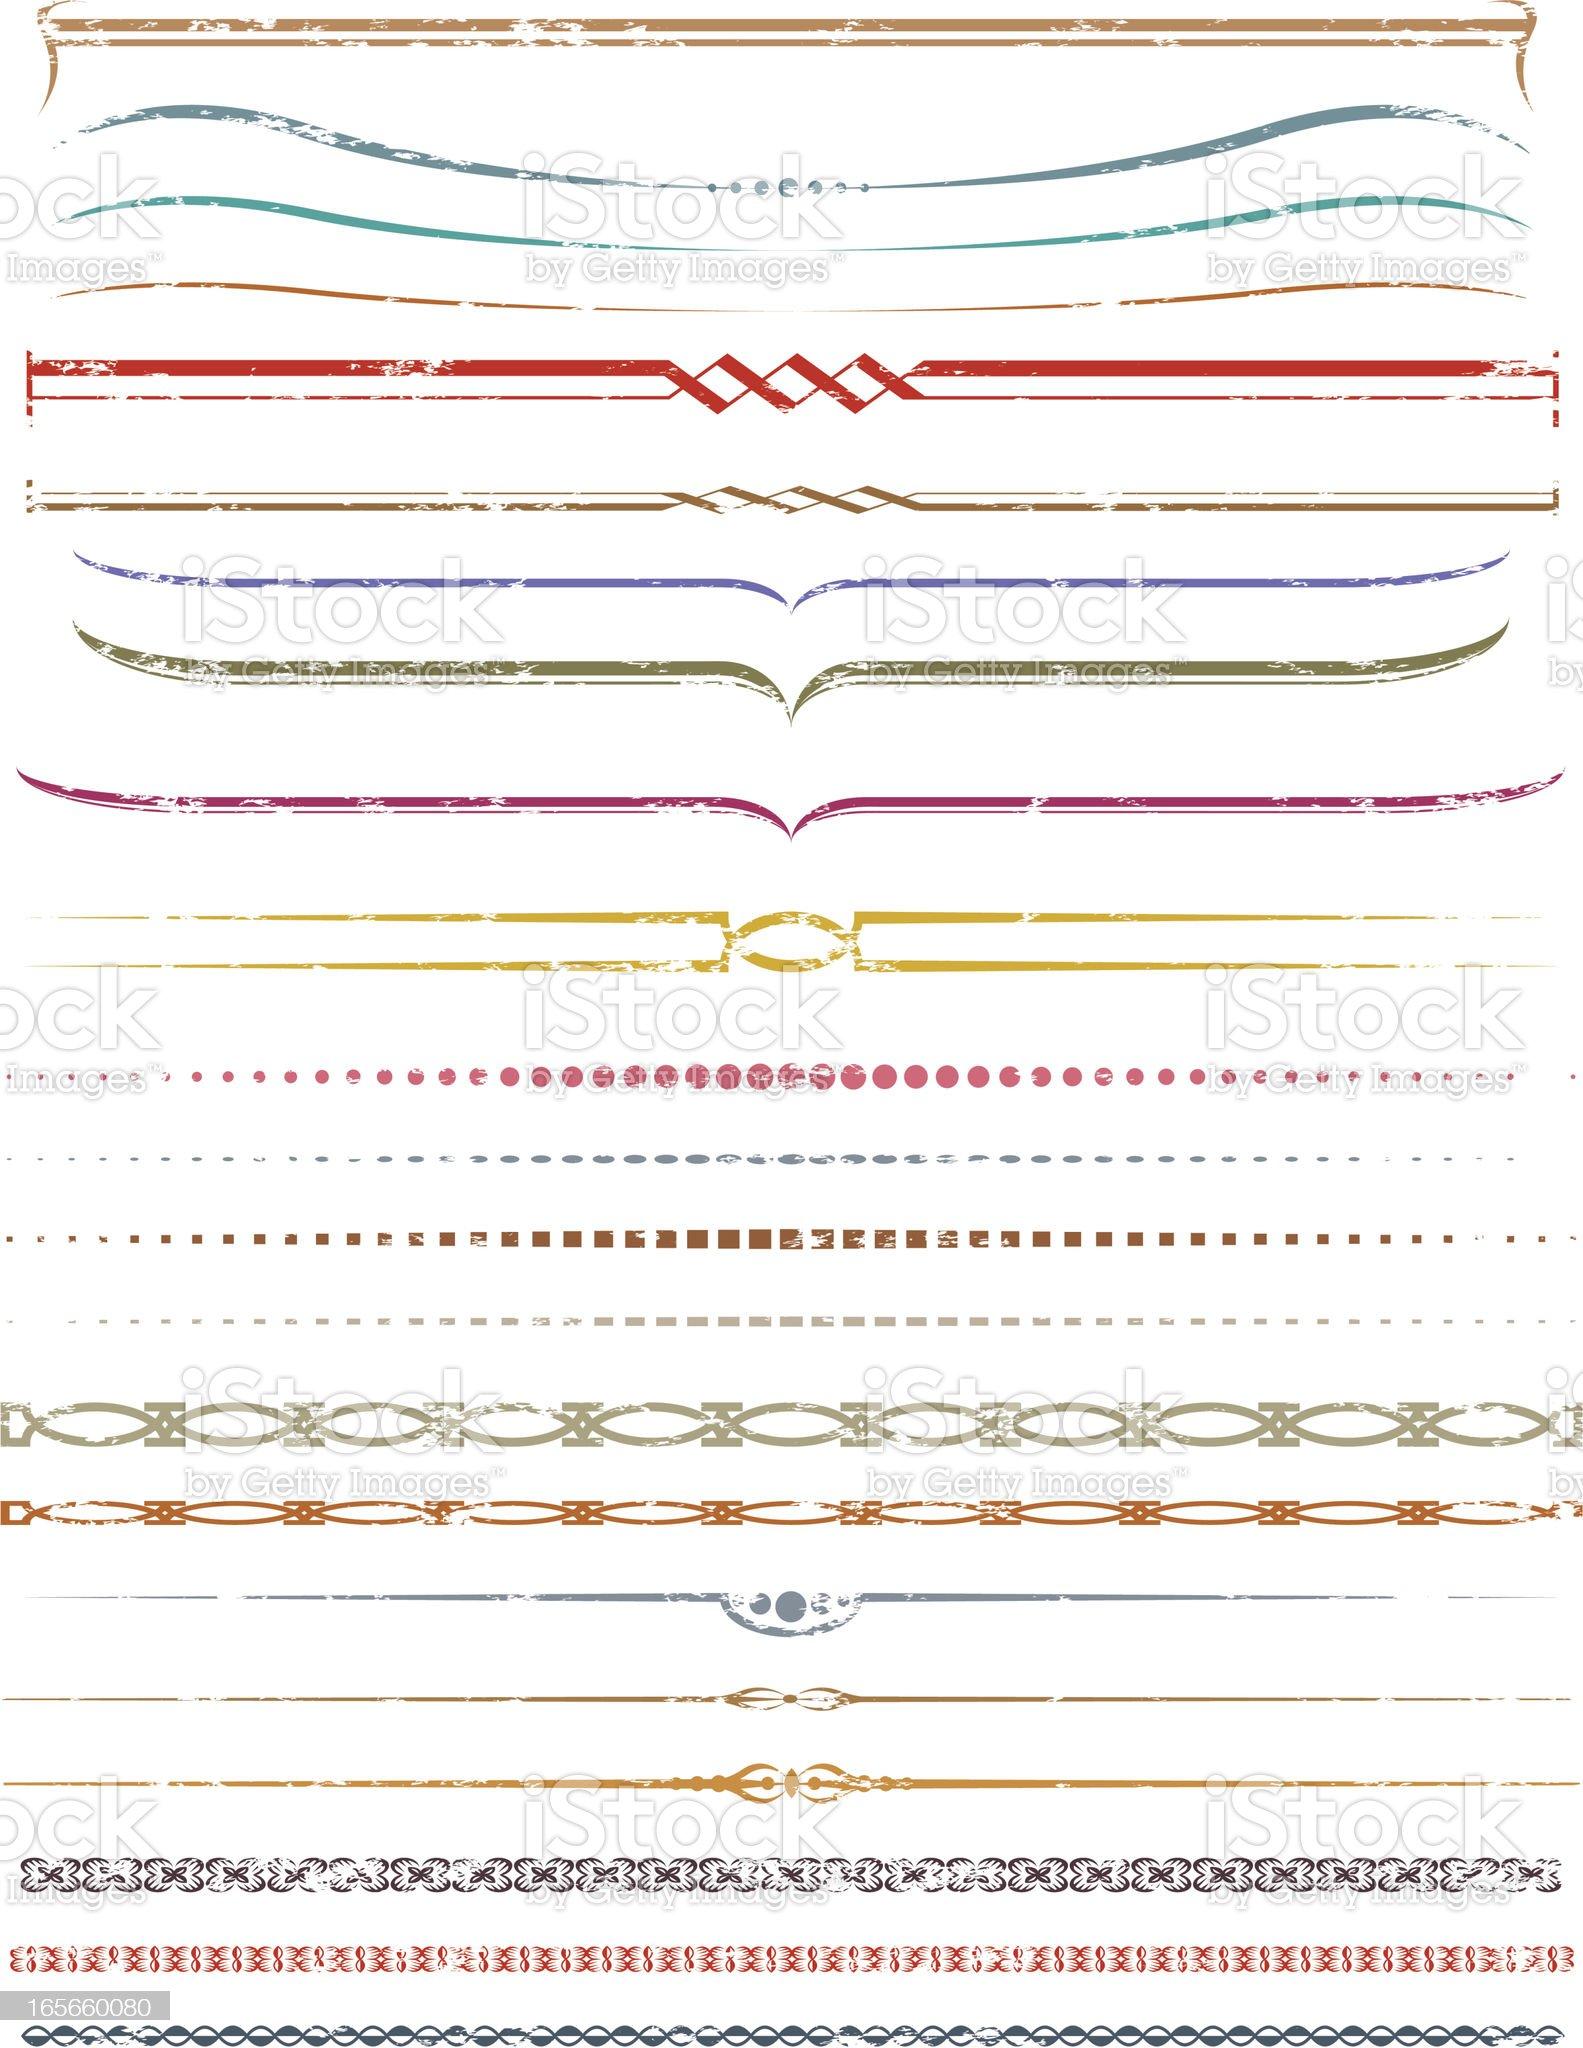 Grunge decorative lines royalty-free stock vector art